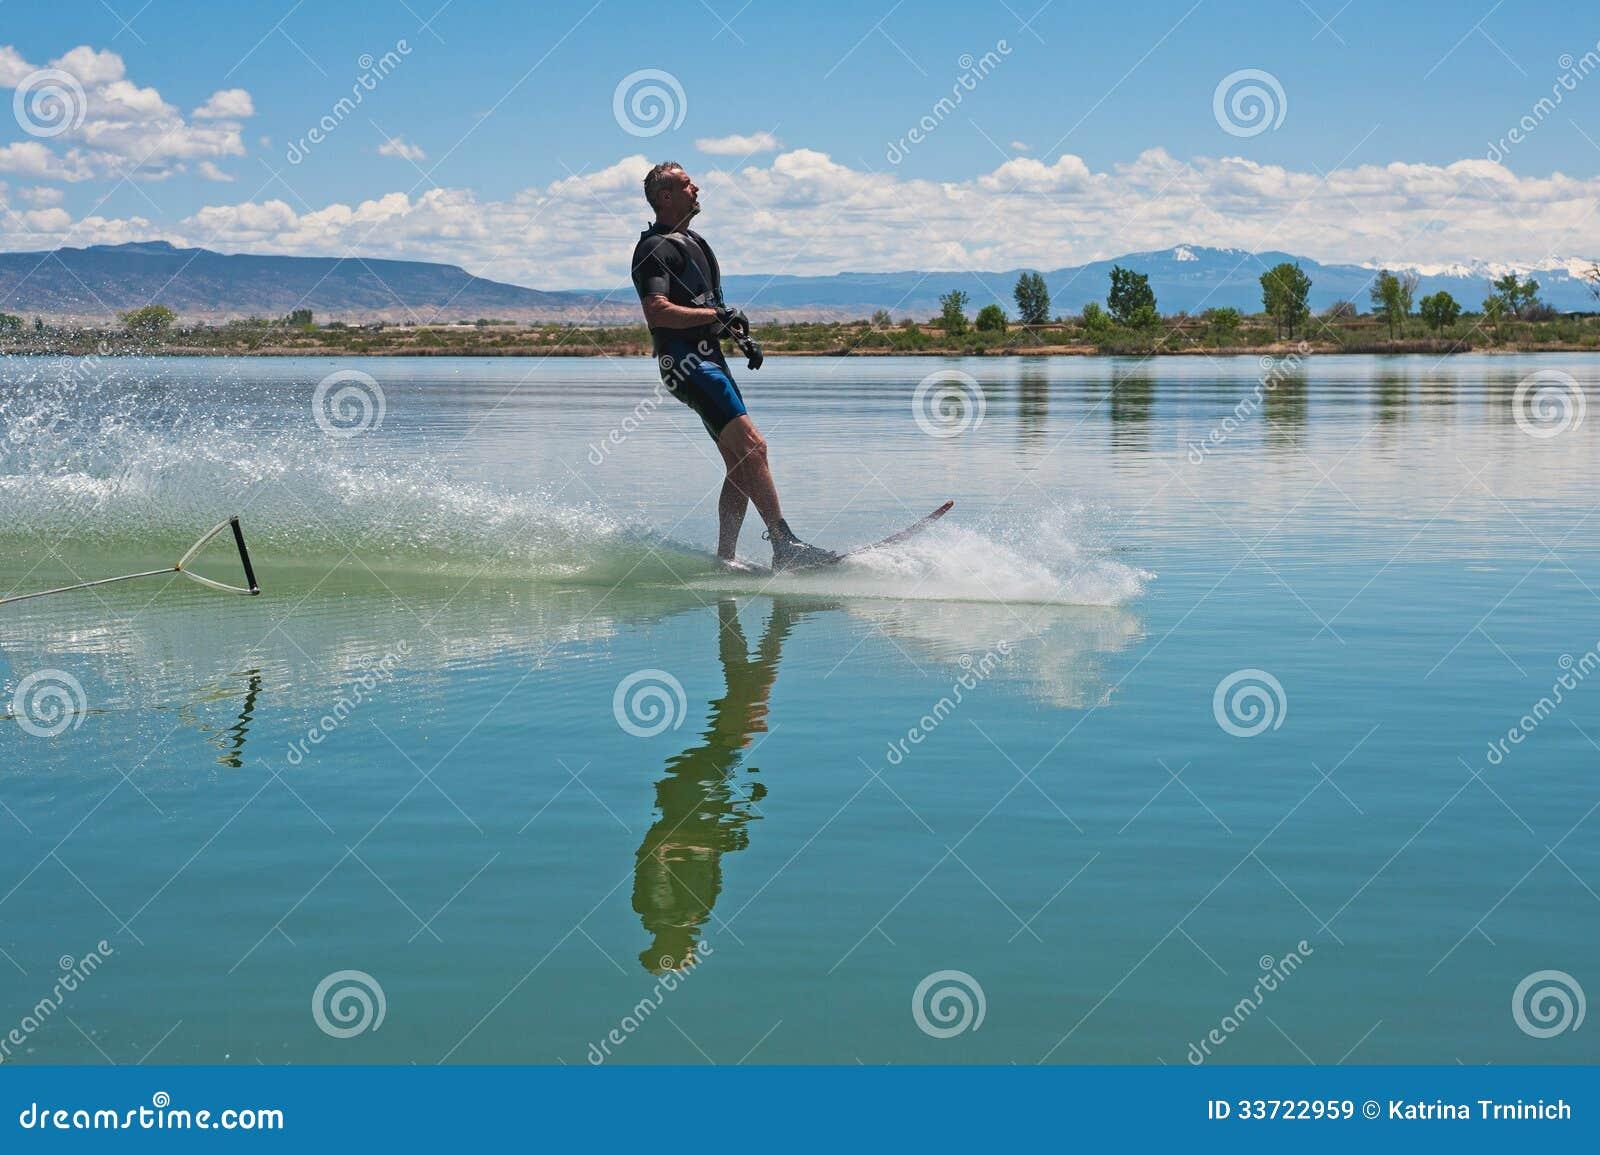 ... Man Slalom Water Skiing Royalty Free Stock Images - Image: 33722959